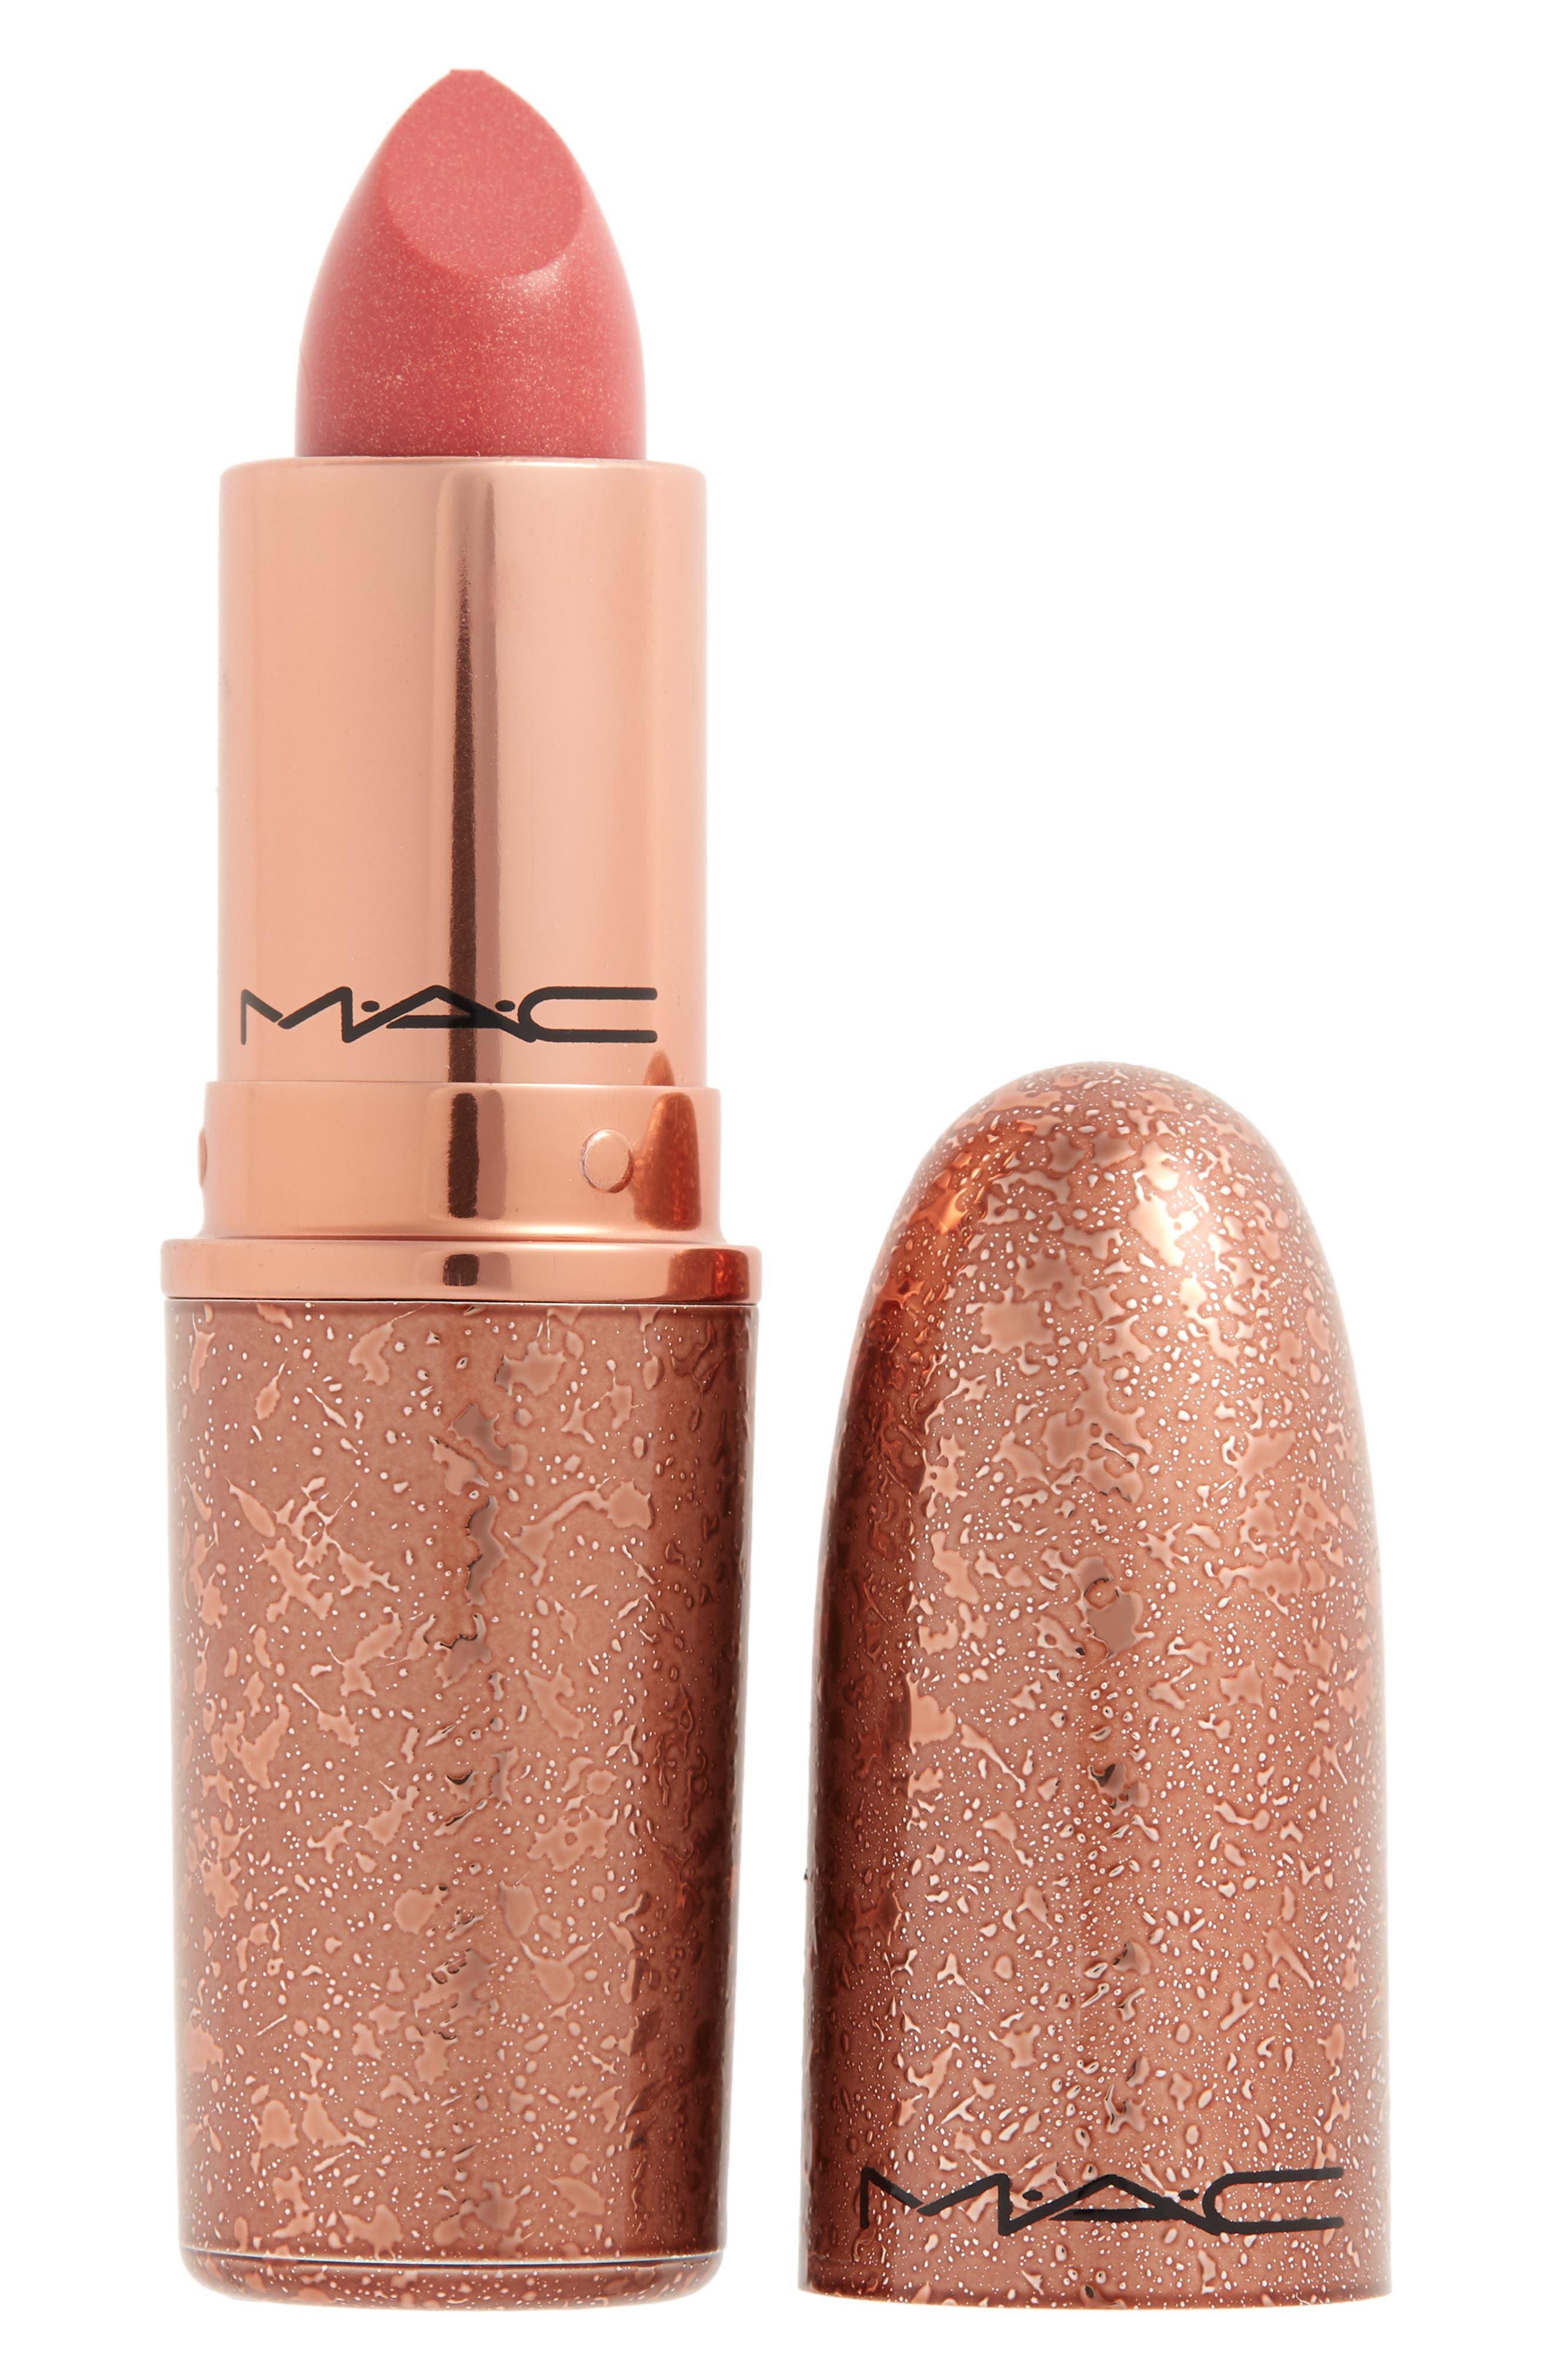 Image of MAC Cosmetics Bronzing 2020 Lustre Lipstick